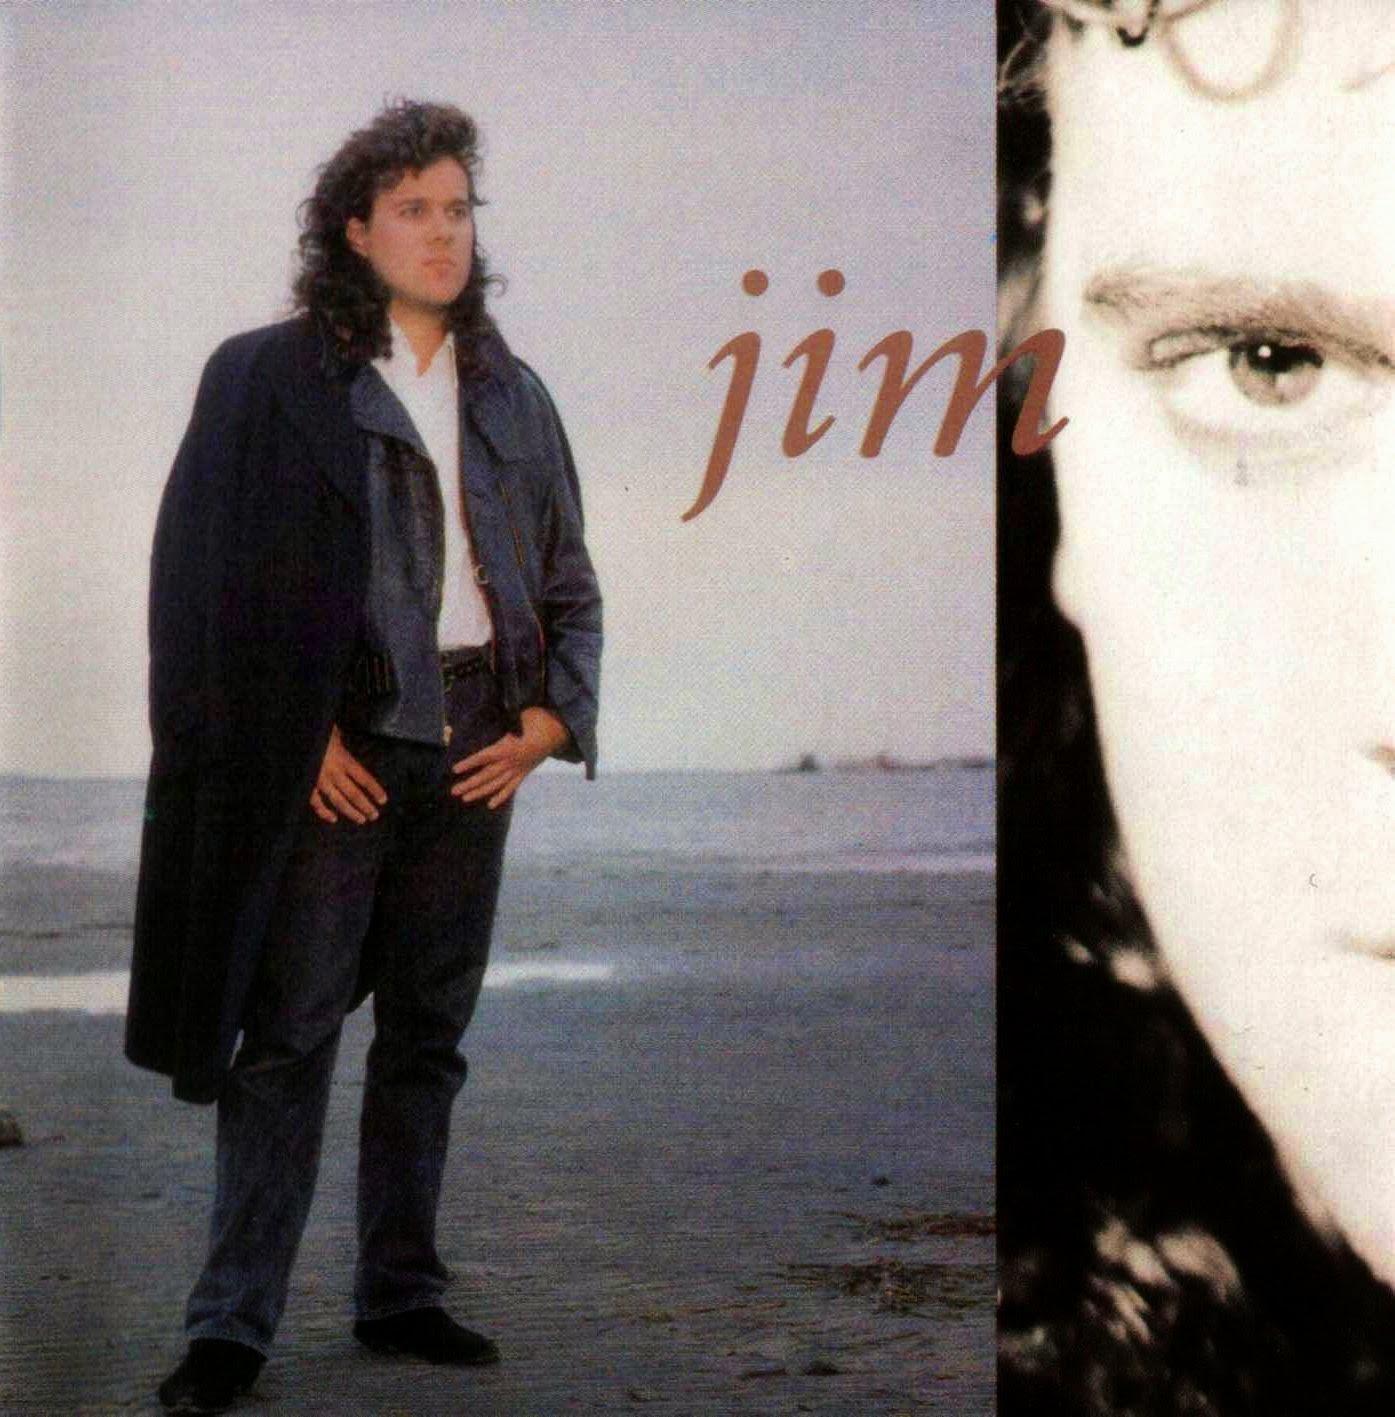 Jim Jidhed Jim 1990